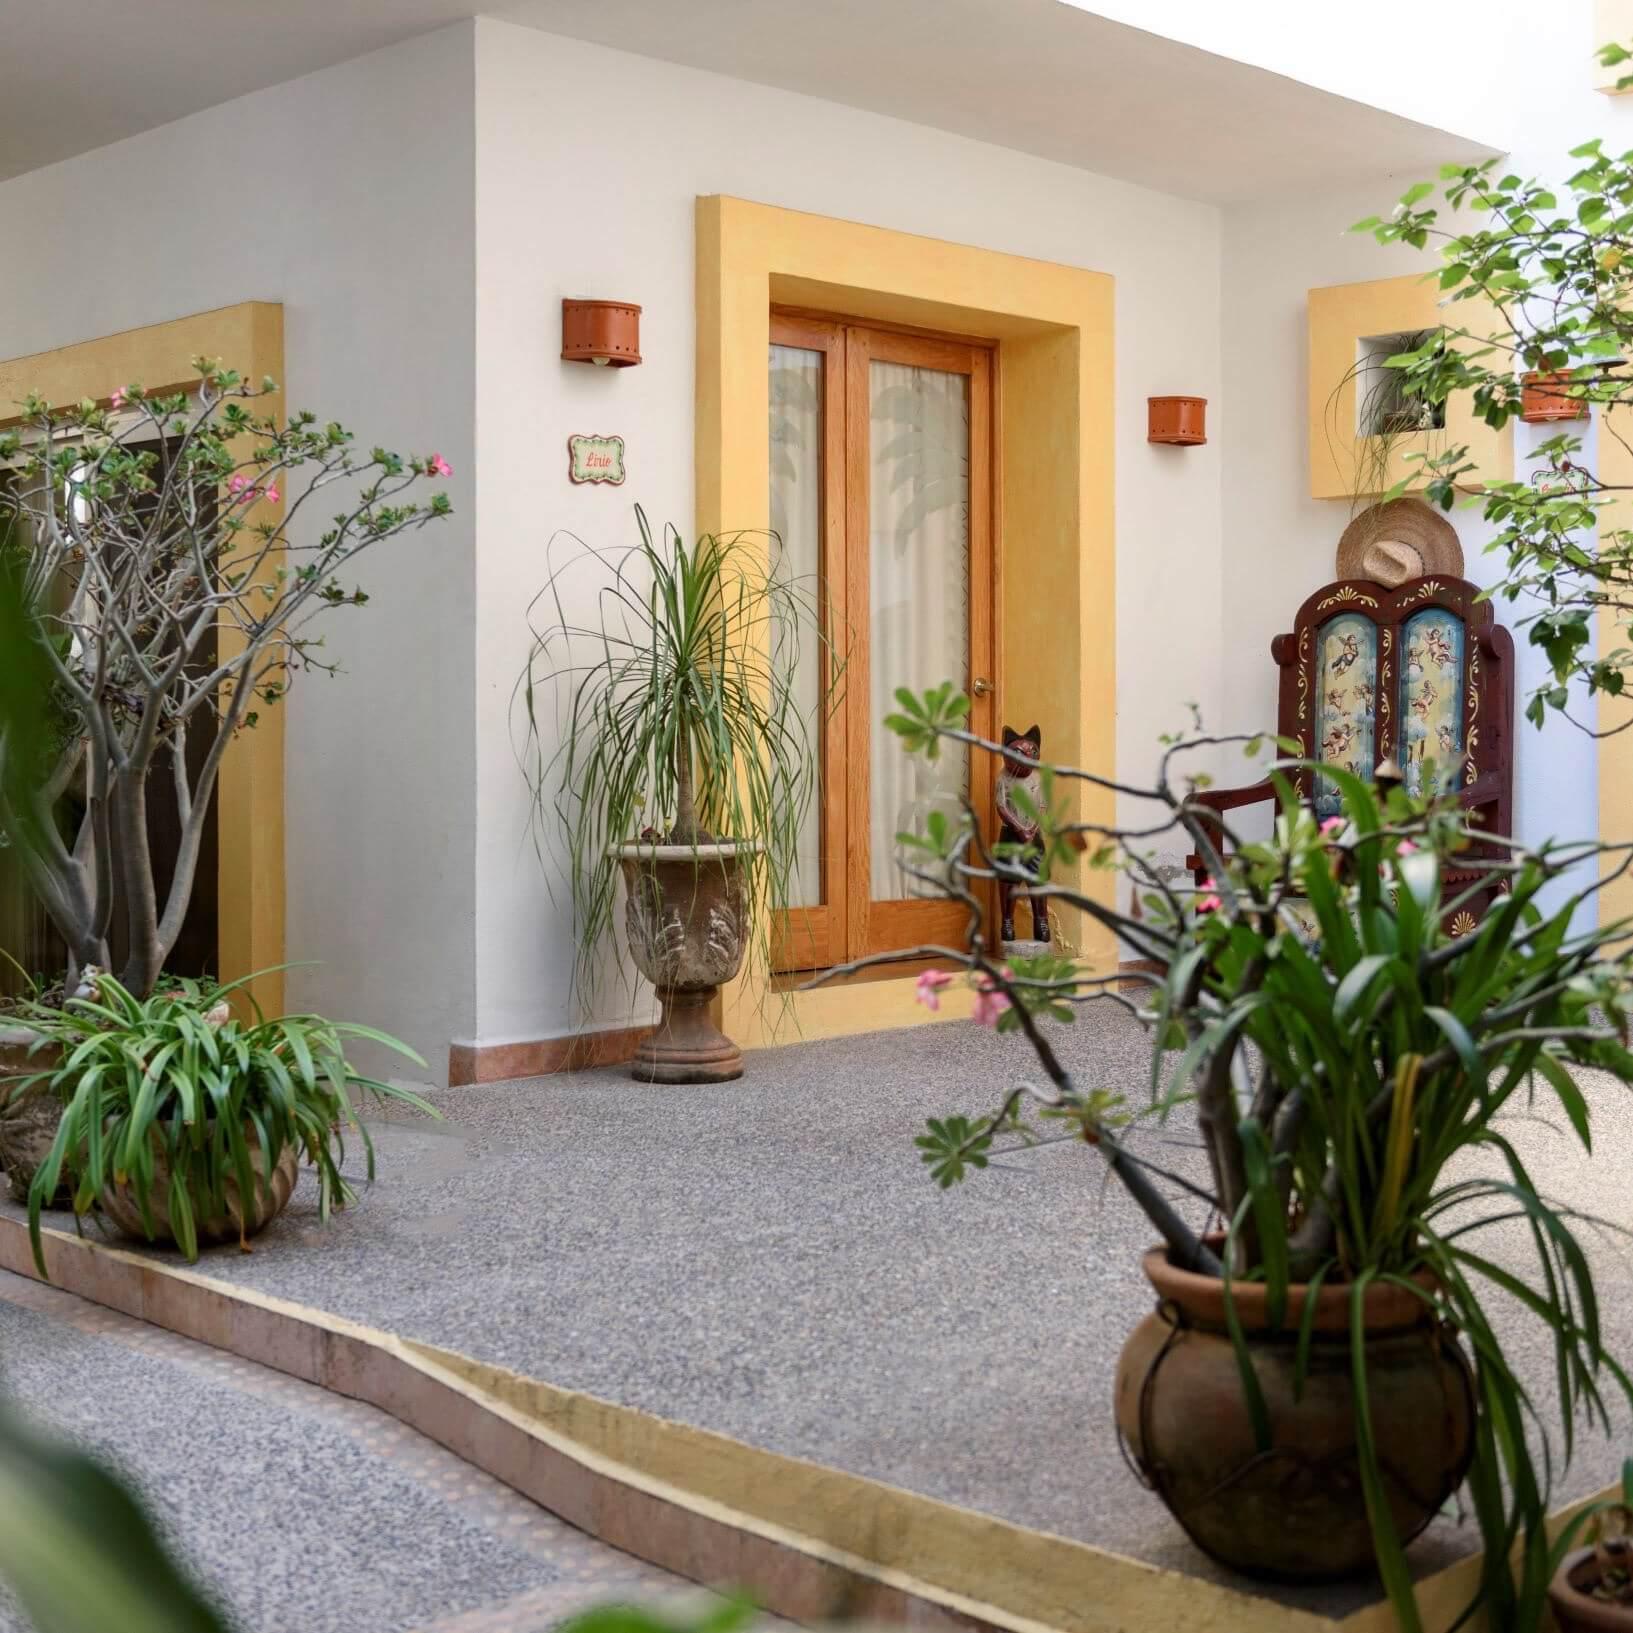 Entrance to the Hacienda Alemana hotel